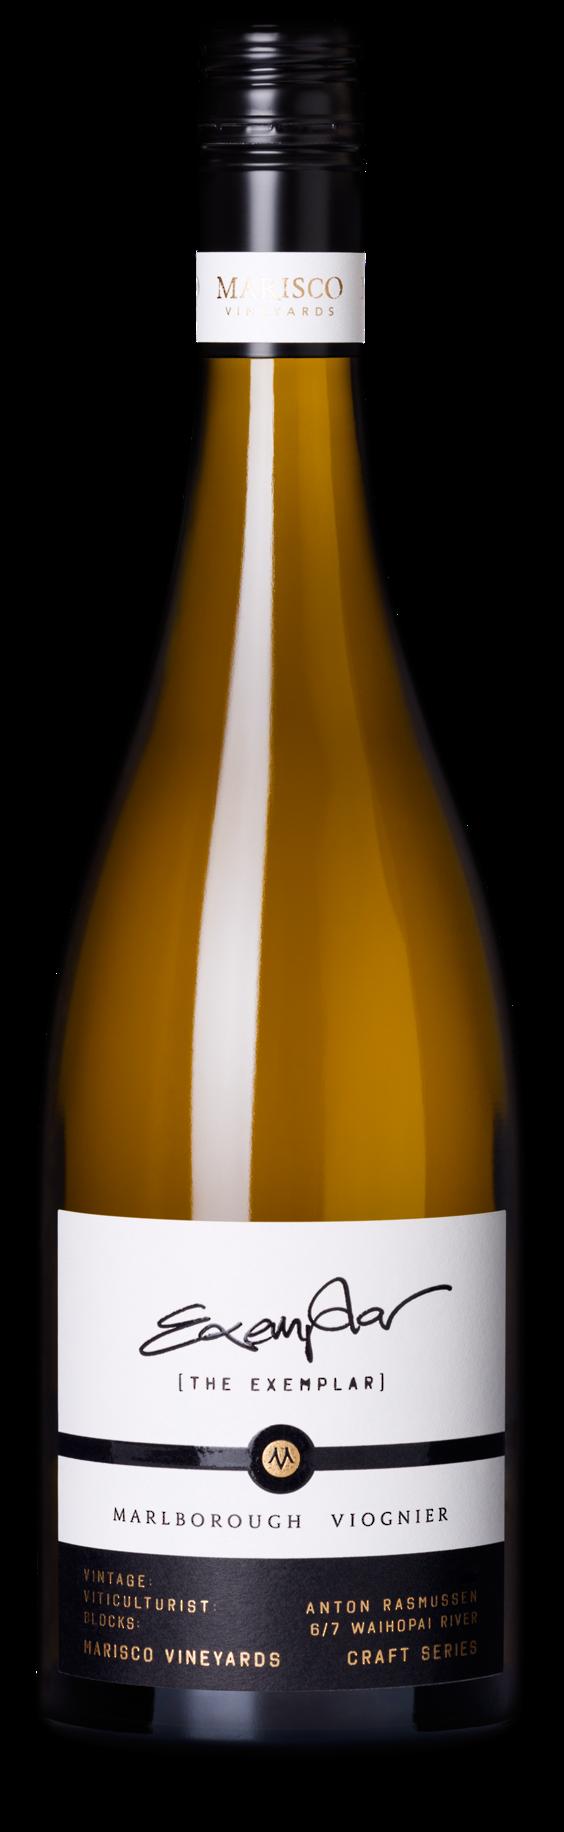 The Exemplar Viognier 2015 image 0